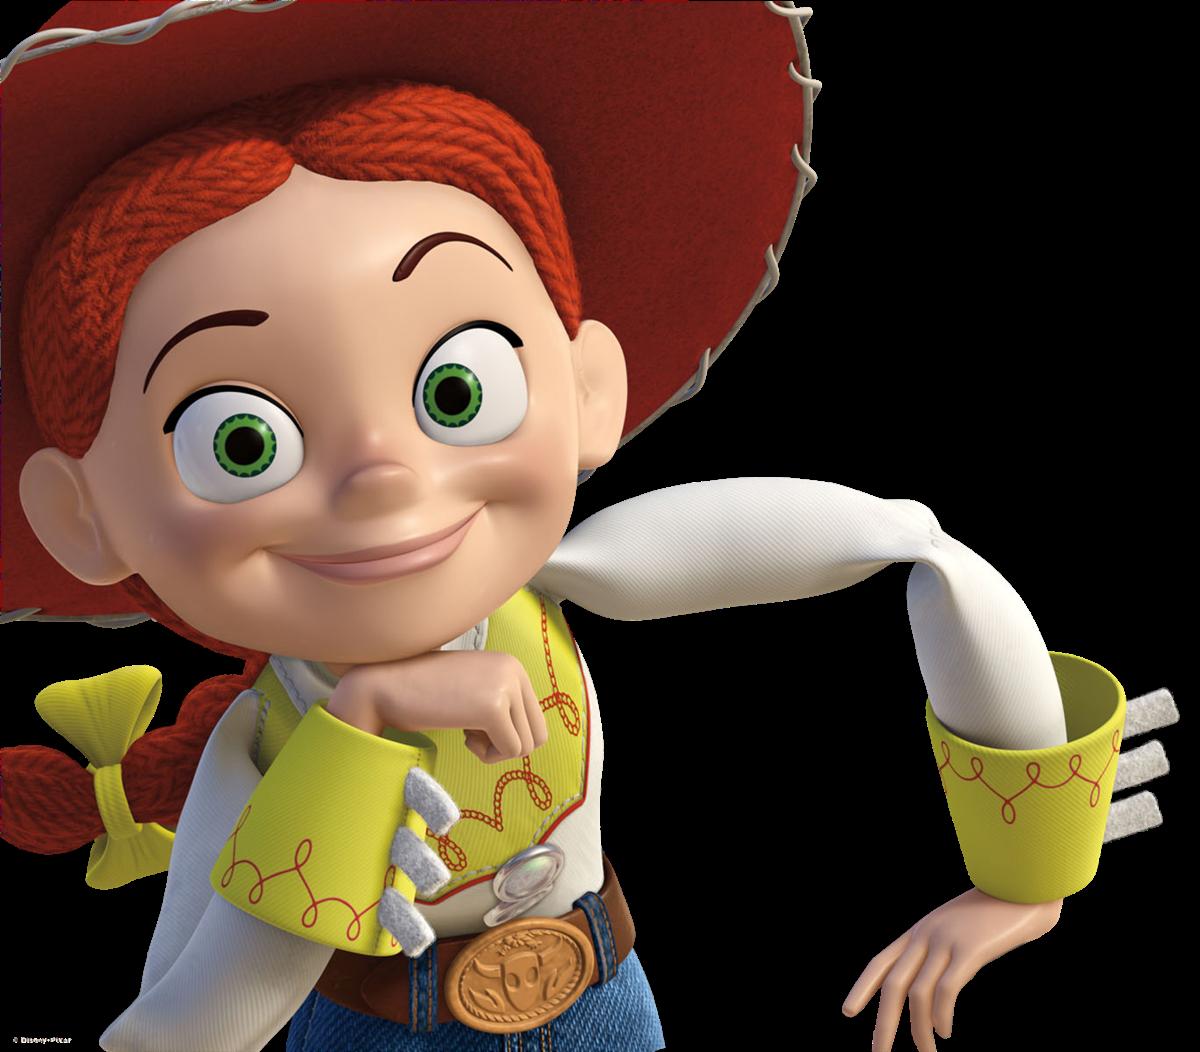 2 Bp Blogspot Com Xnzekwnfro8 Vopqabt 13i Aaaaaaaaoyg Wuvzgpfyosa S1600 Jessie From Toy Story 2 Png Jessie De Toy Story Toy Story Toy Story Dulceros